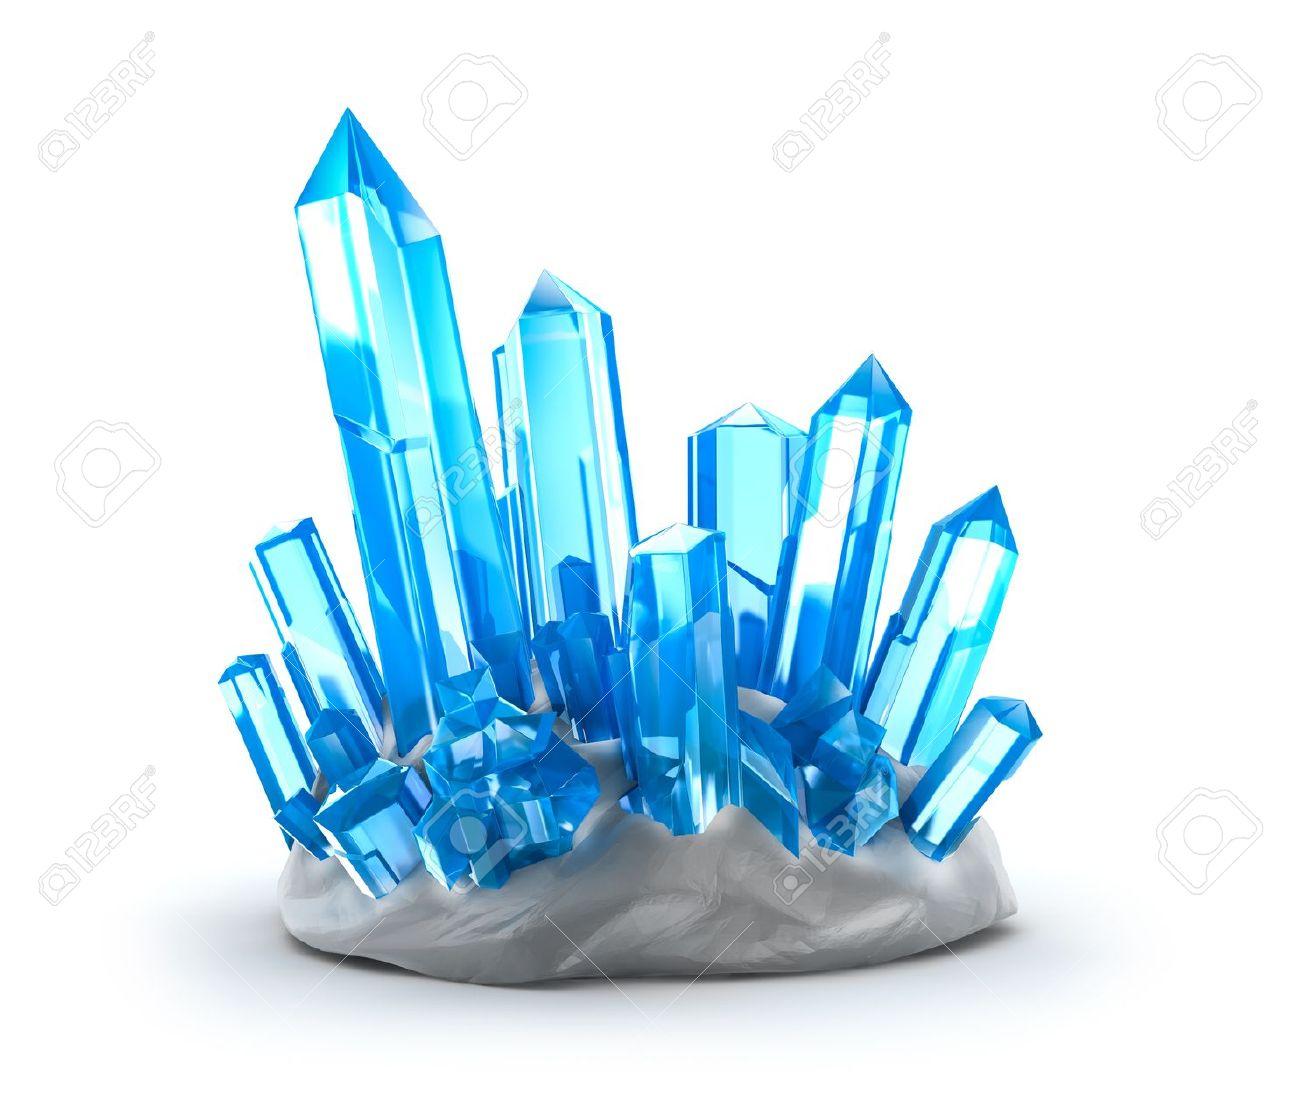 Hd crystal clear clipart.